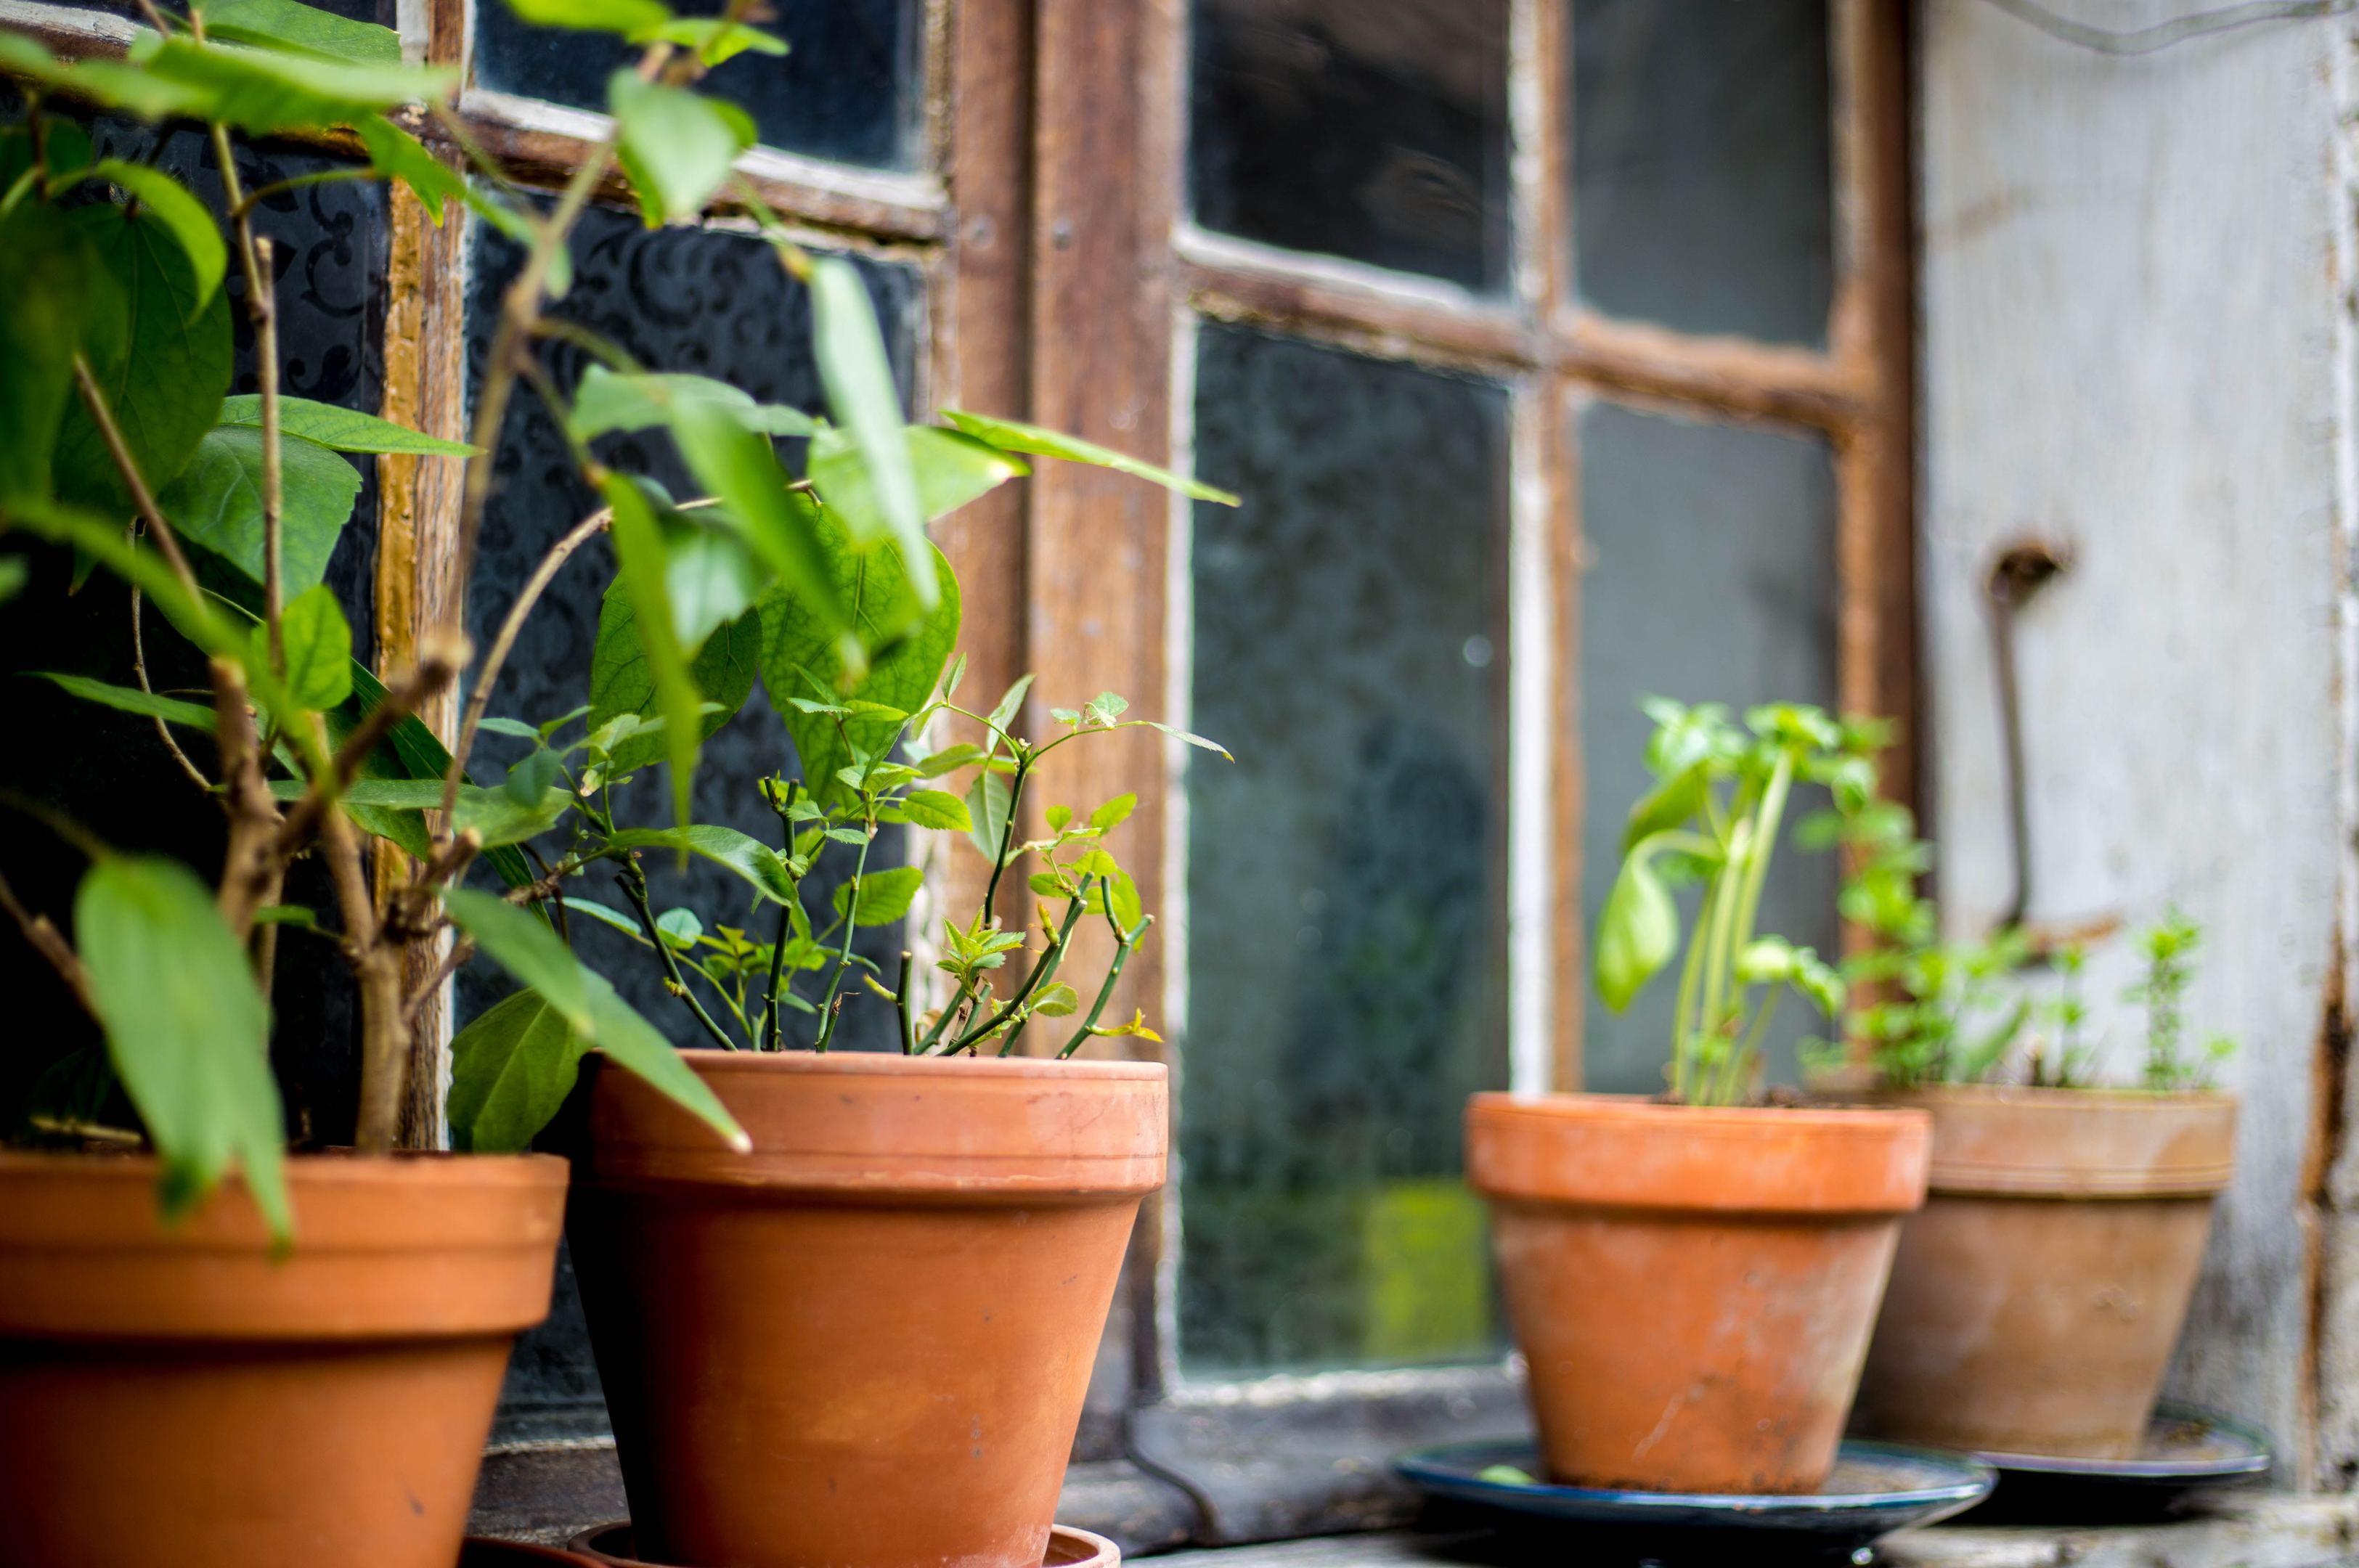 easy tips to grow fruit and veg